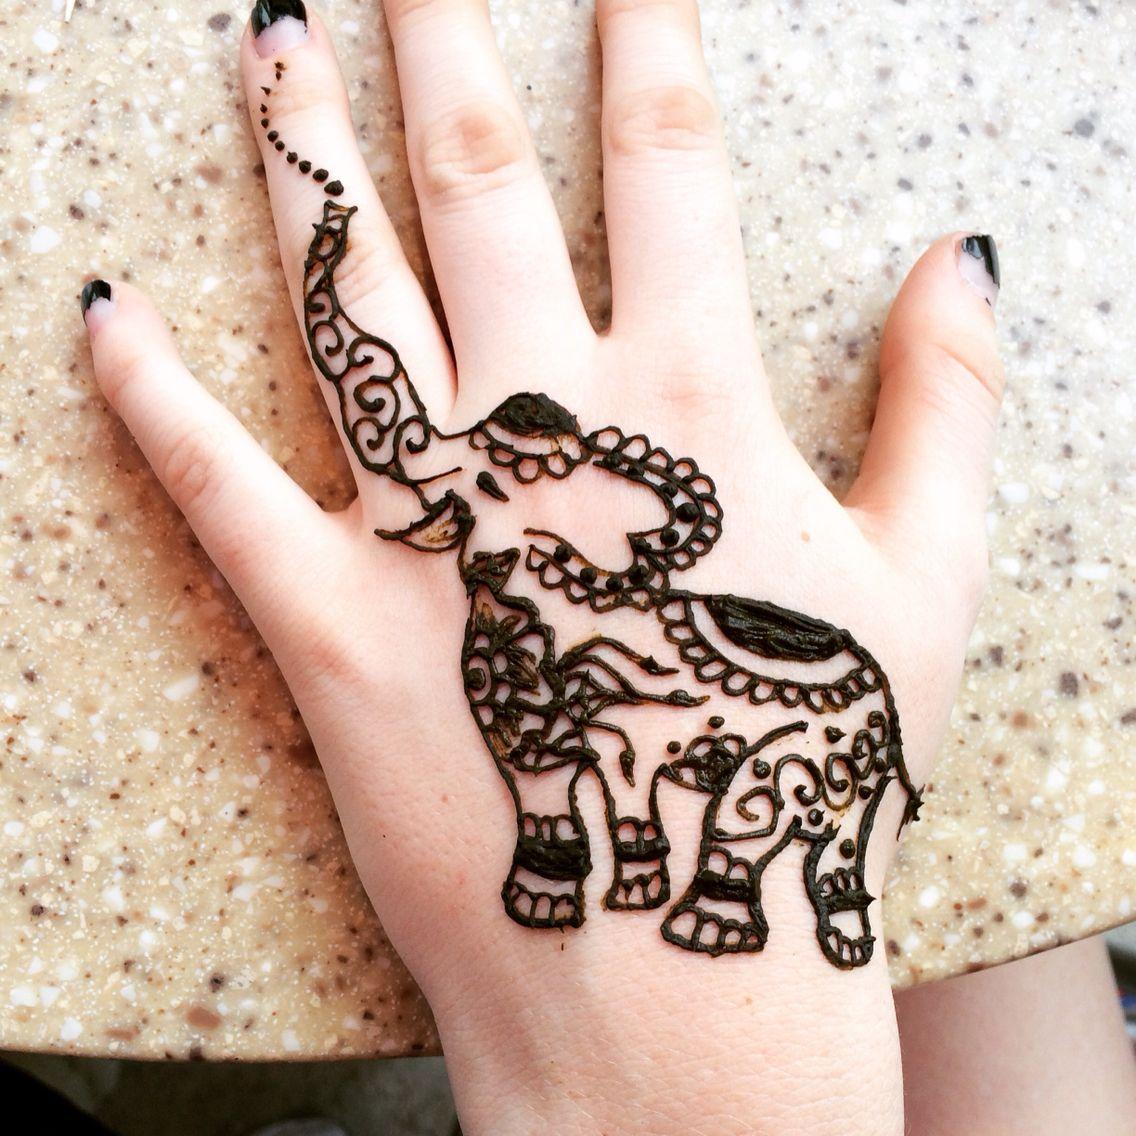 Animal Face Tattoo - Tattoo Maze |Henna Tattoo Design Animals